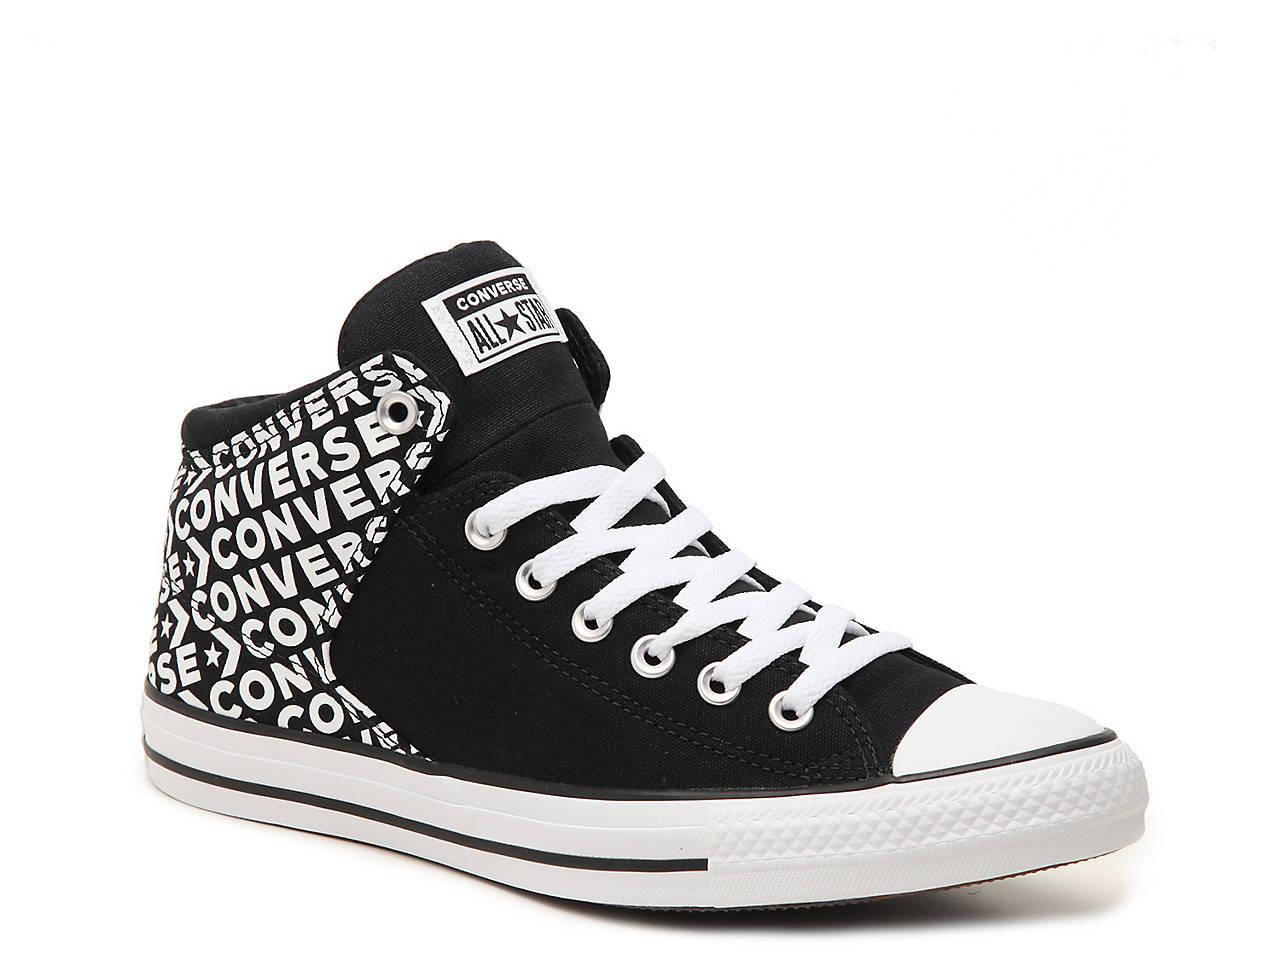 898952ea1389 Converse Chuck Taylor All Star Hi Street Word High-Top Sneaker ...